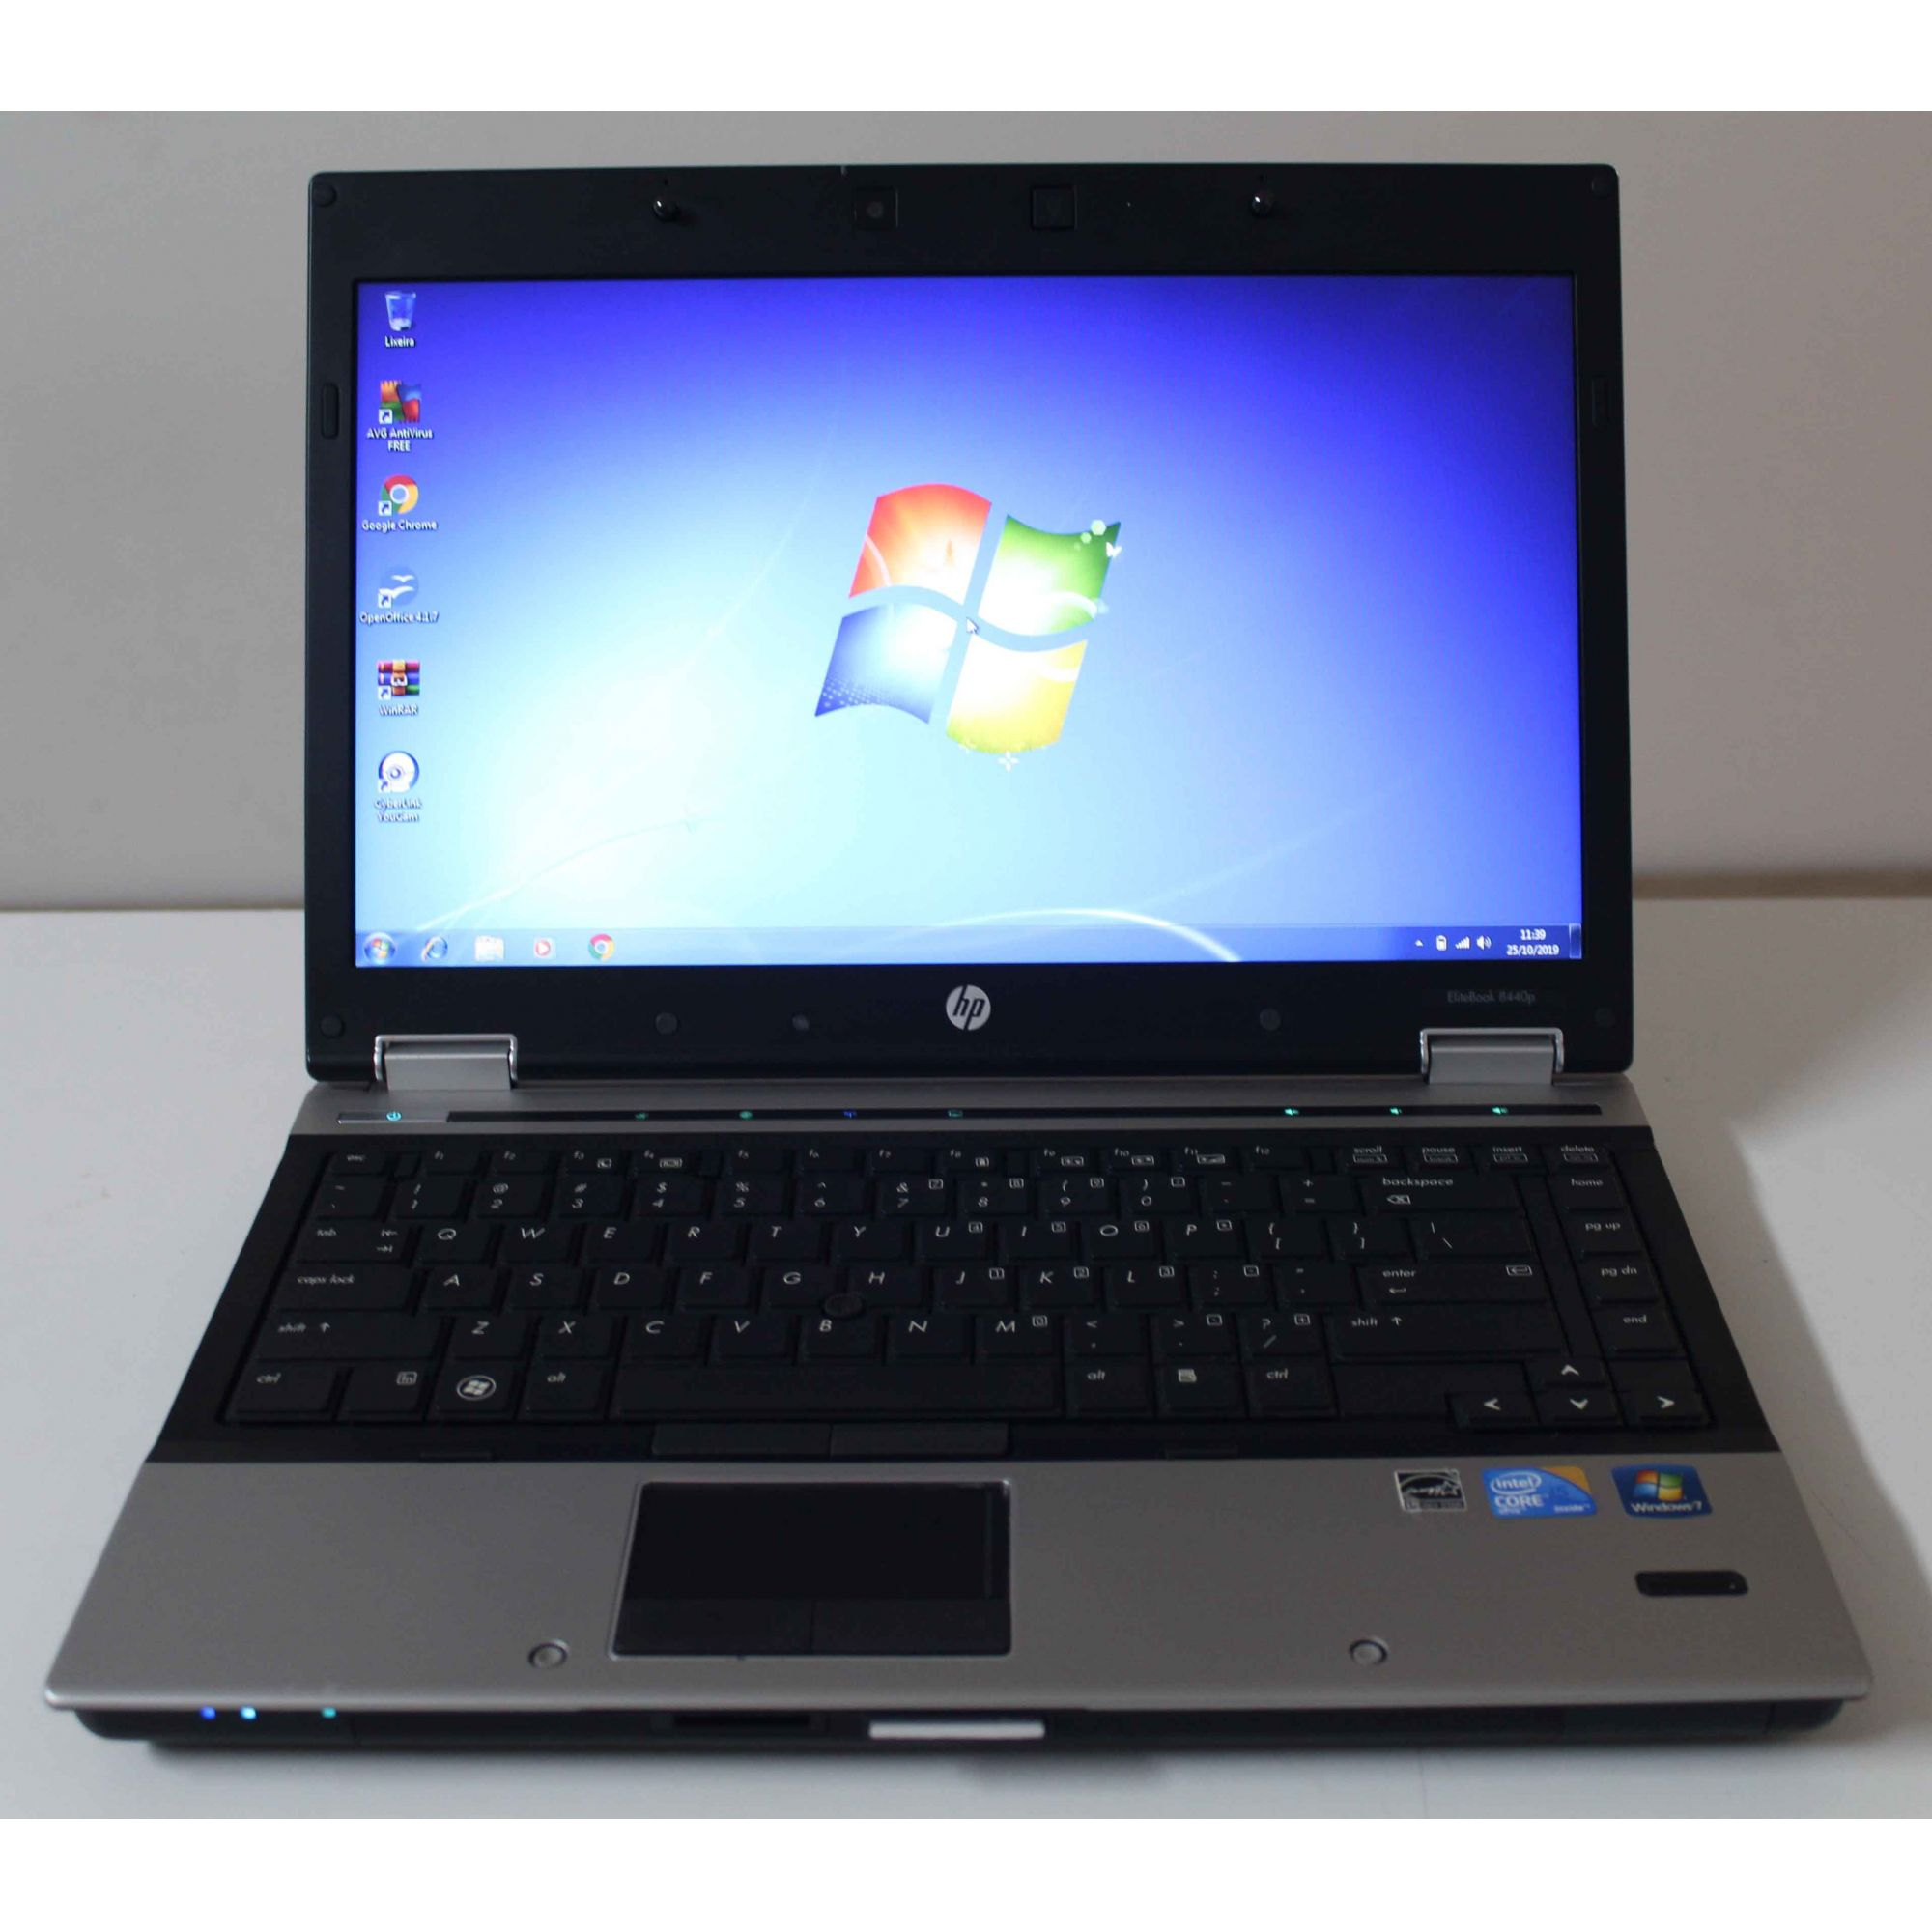 "Notebook HP EliteBook 8440p 14"" Intel Core i5 2.40GHz 4GB HD-250GB"